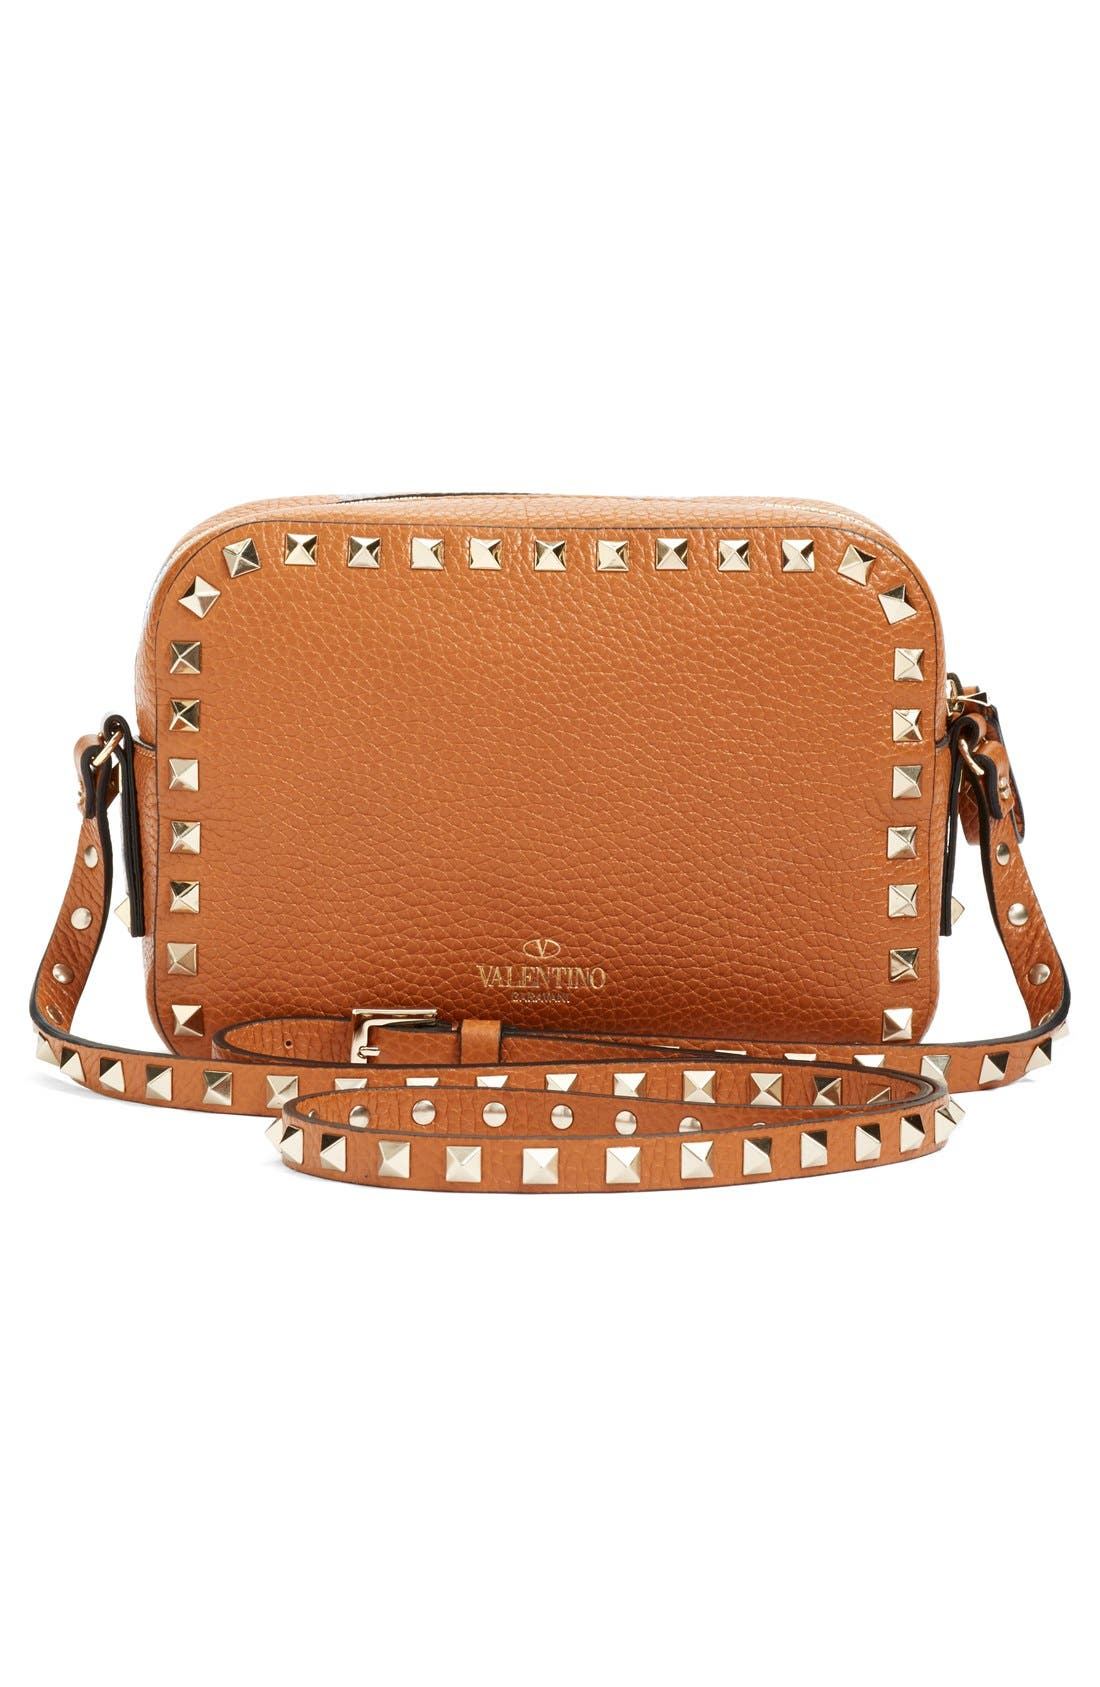 Alternate Image 3  - Valentino 'Rockstud - Alce' Calfskin Leather Camera Crossbody Bag